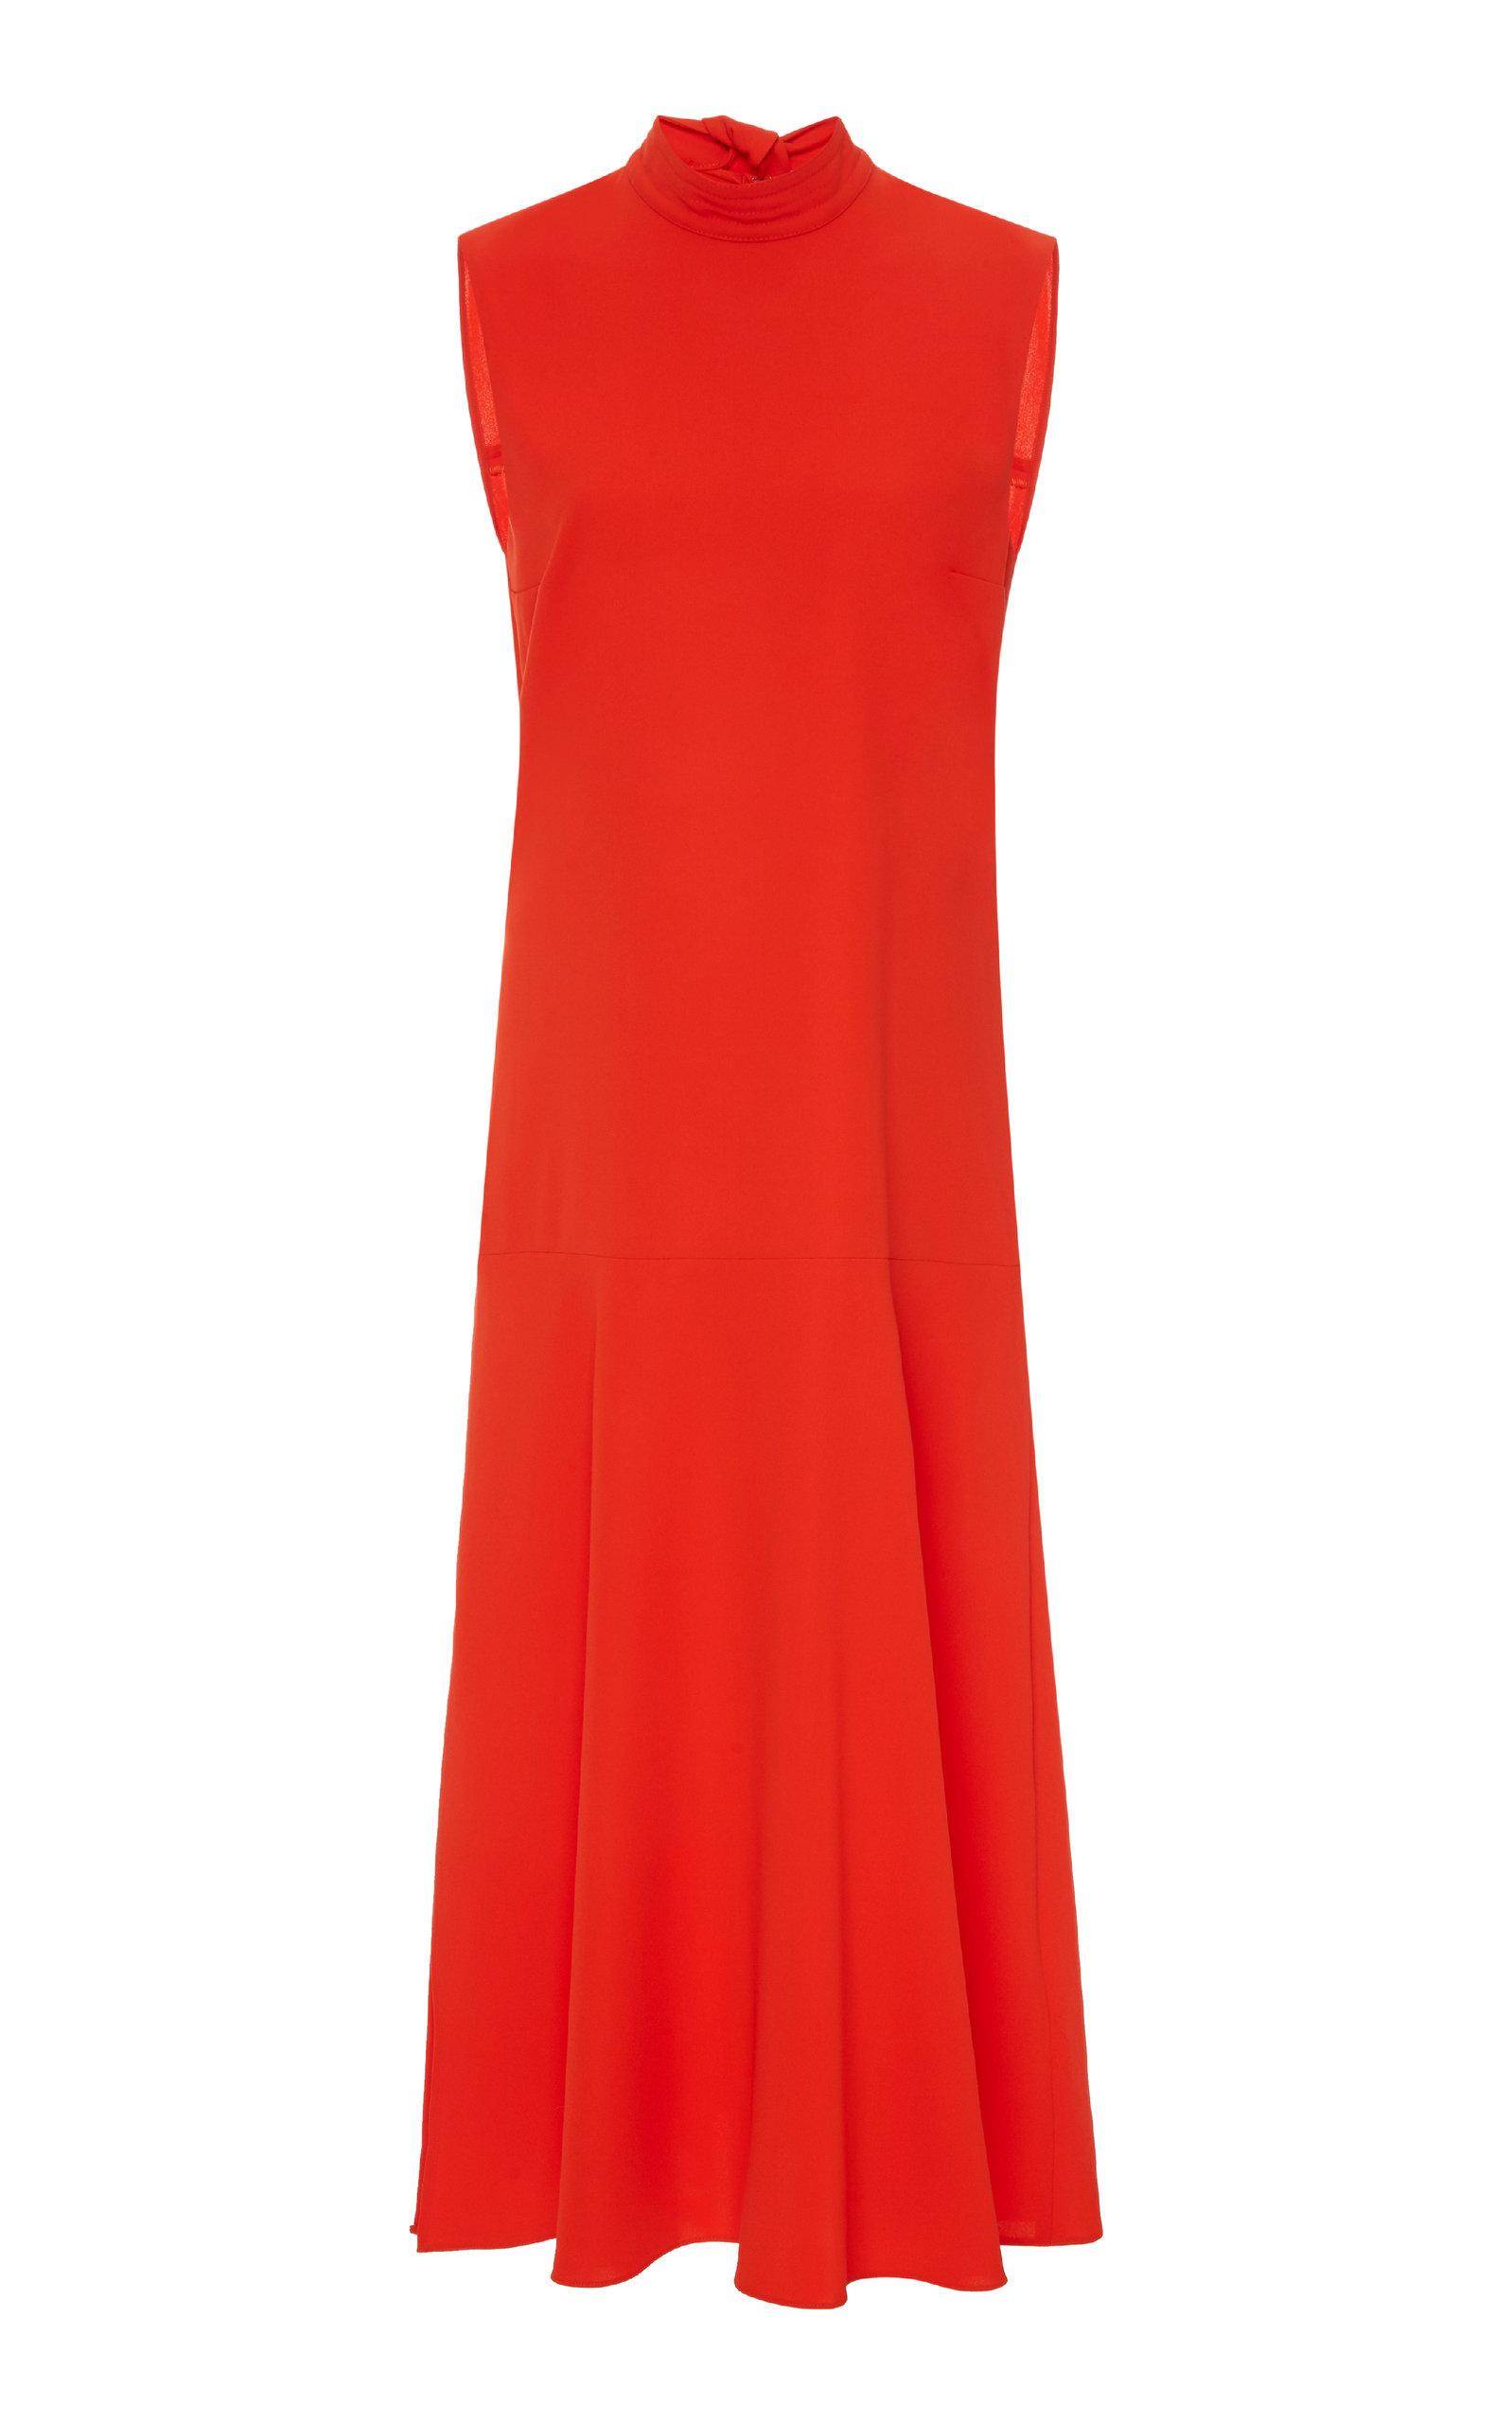 Buy Victoria Victoria Beckham Crepe Tie-Neck Midi Dress online, shop Victoria Victoria Beckham at the best price